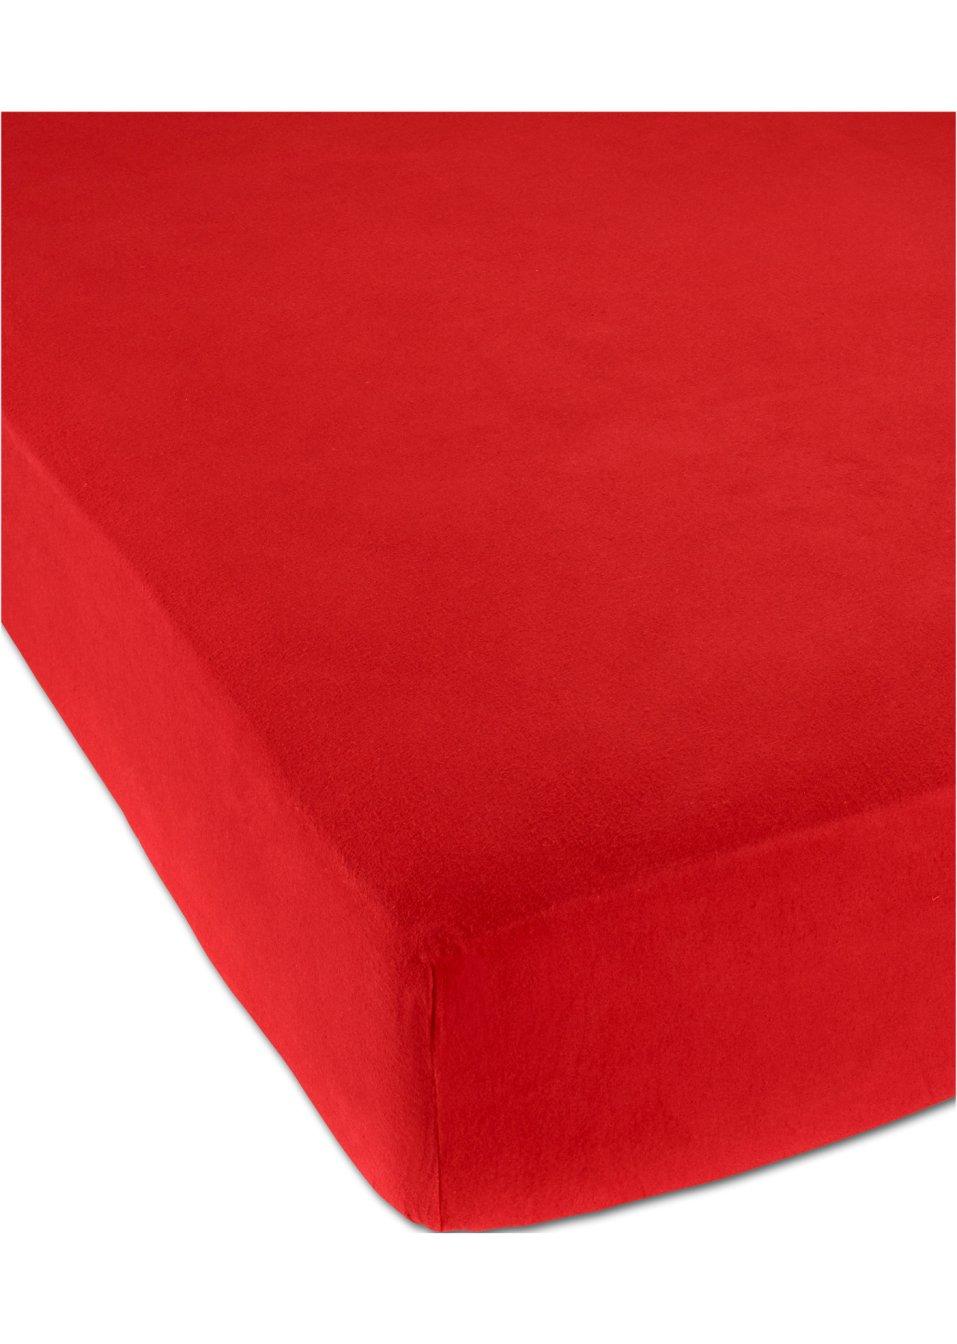 spannbettlaken biber f r kuschelige n chte rot o abb. Black Bedroom Furniture Sets. Home Design Ideas